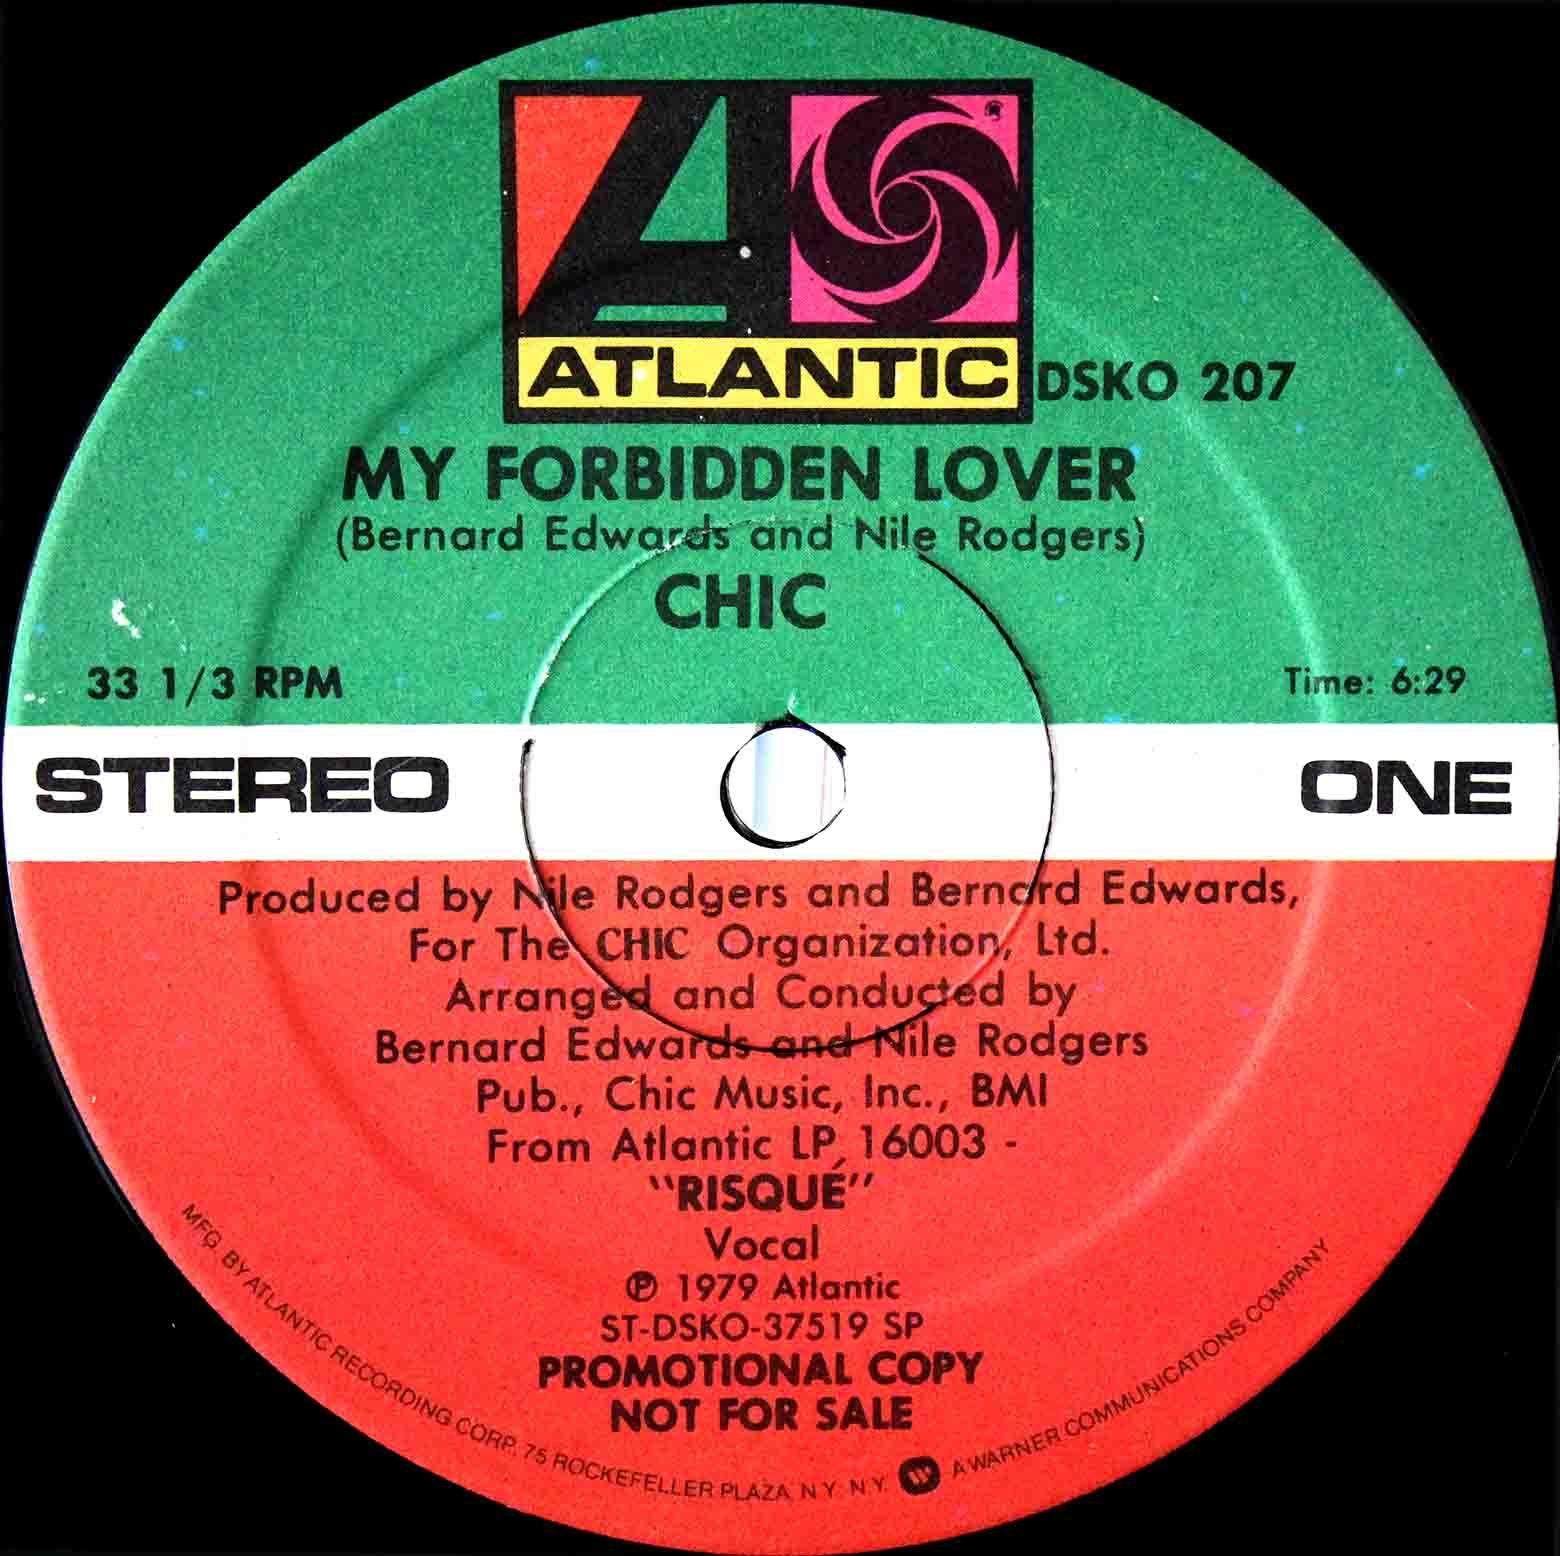 Chic – My Forbidden Lover 03